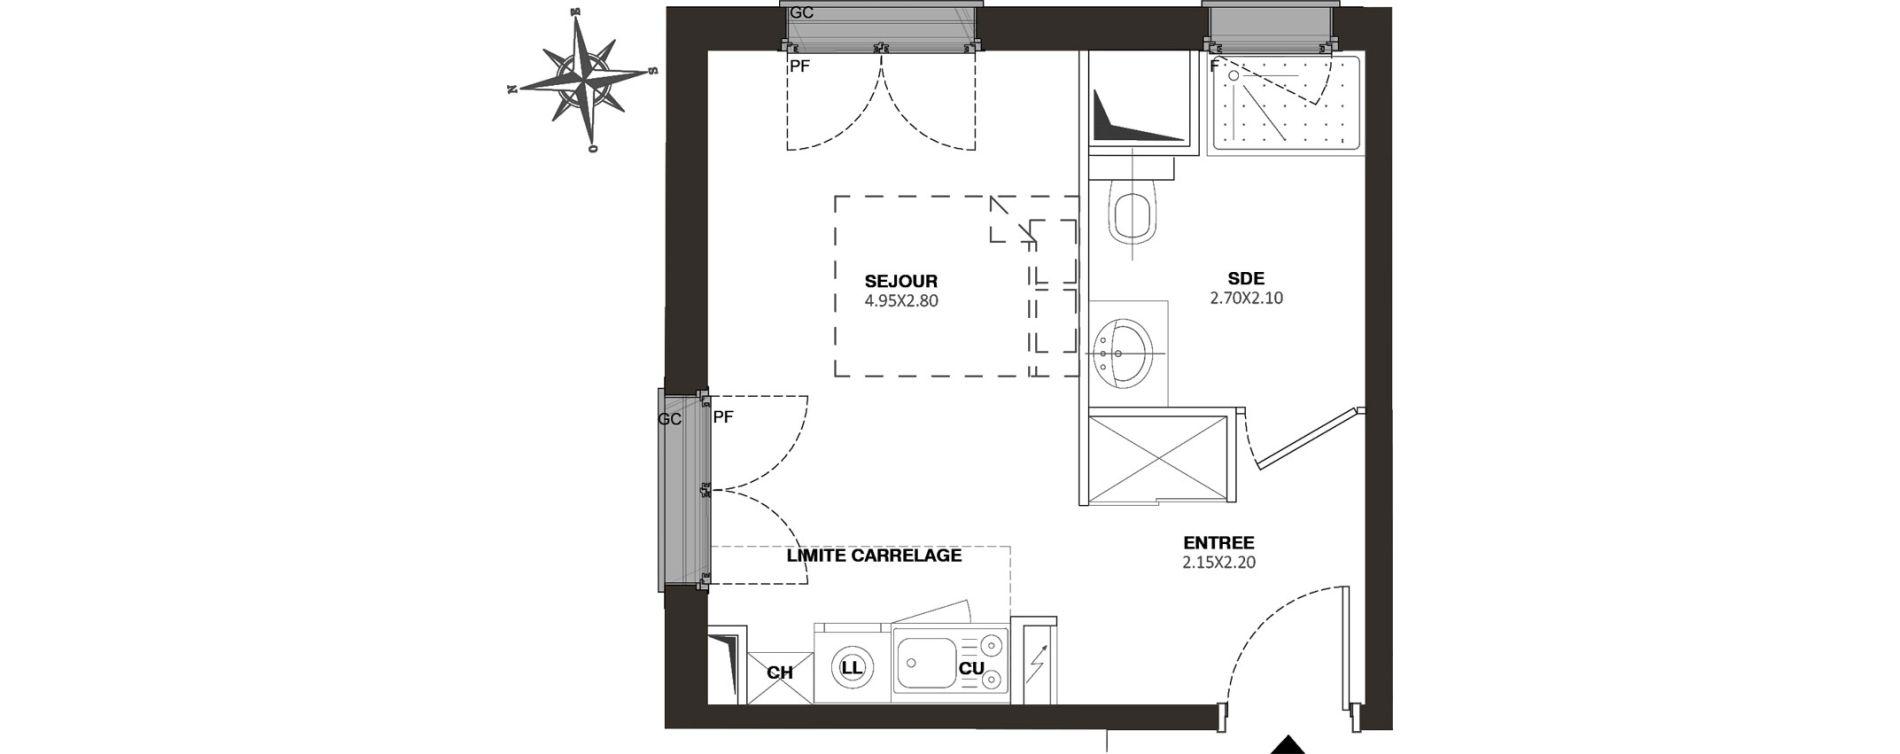 Appartement T1 de 23,50 m2 à Viroflay Rive droite viroflay